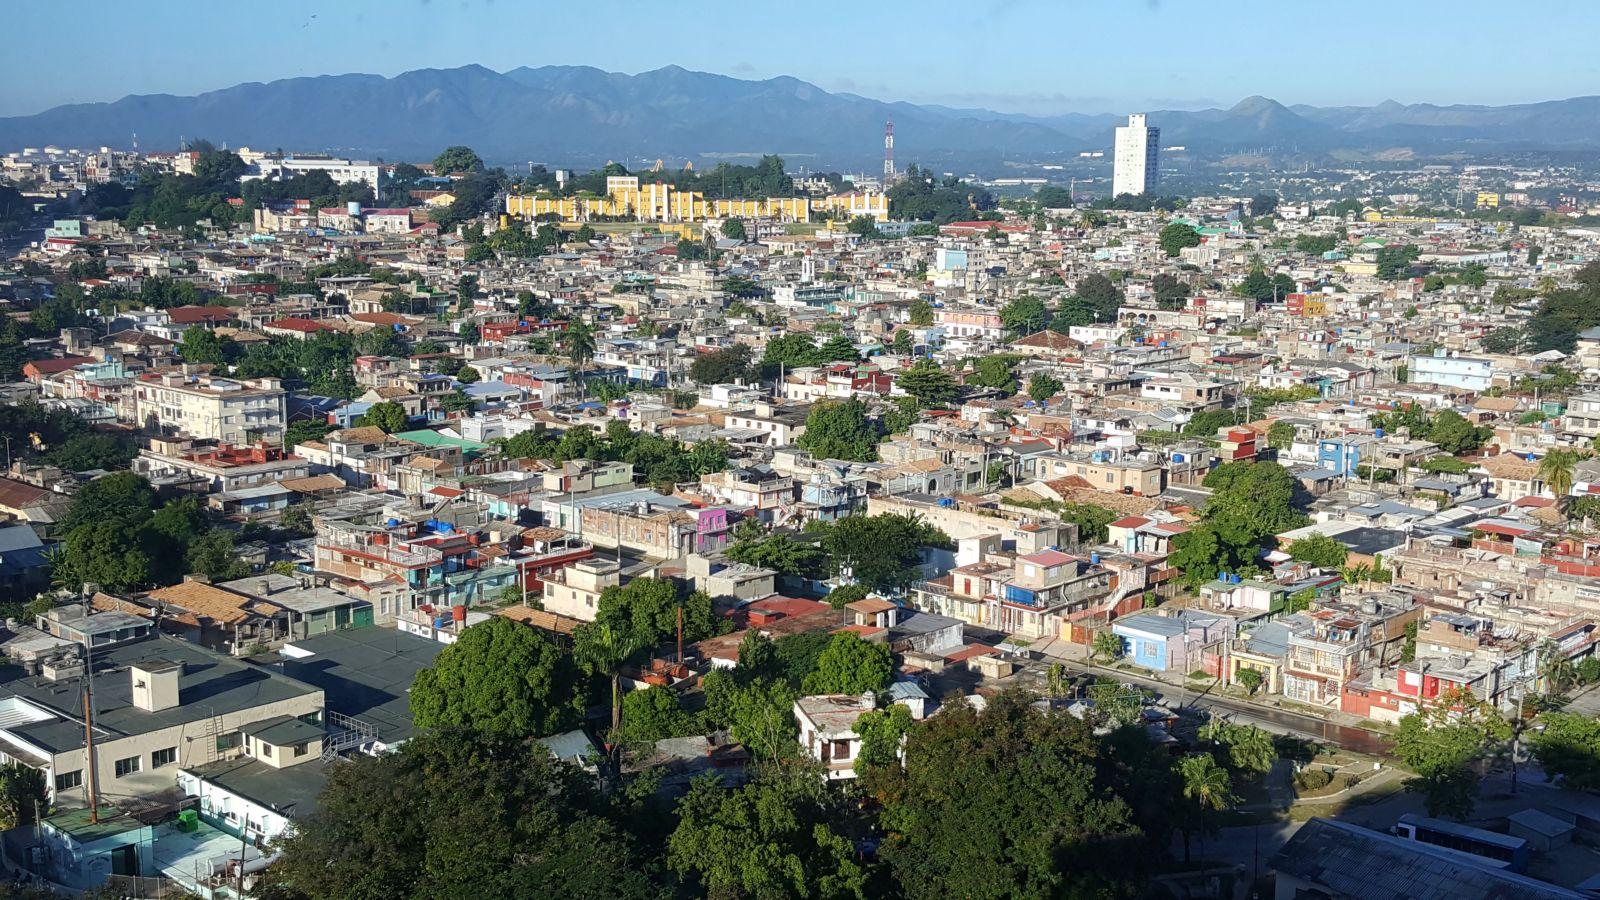 141 Santiago de Cuba